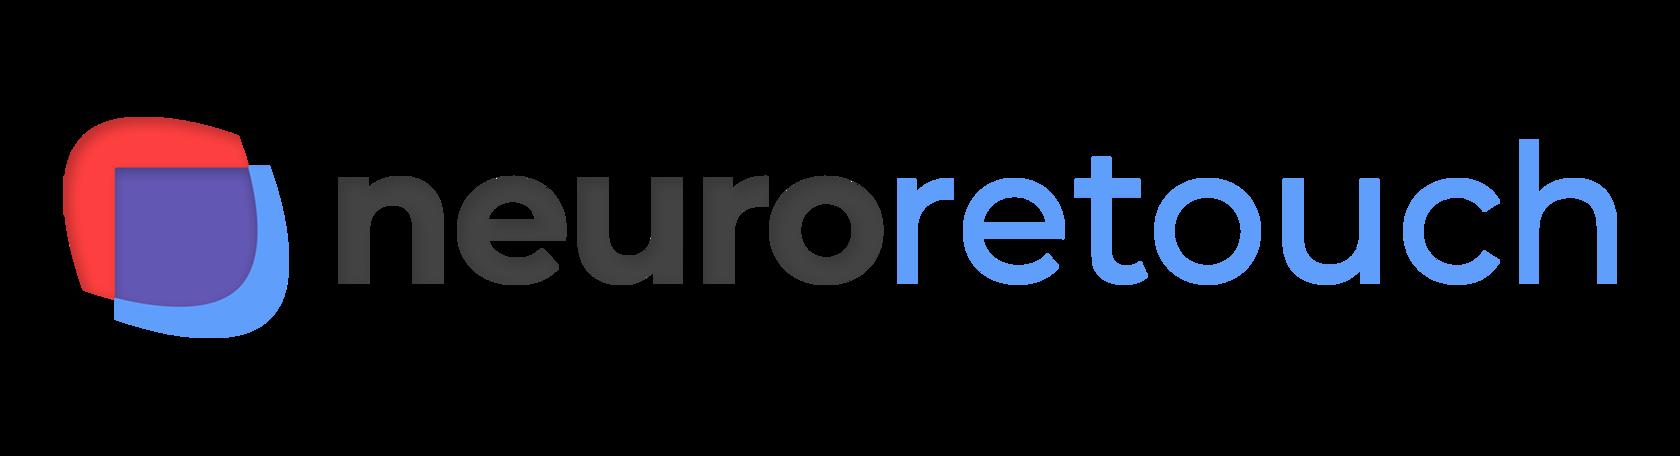 NeuroRetouch